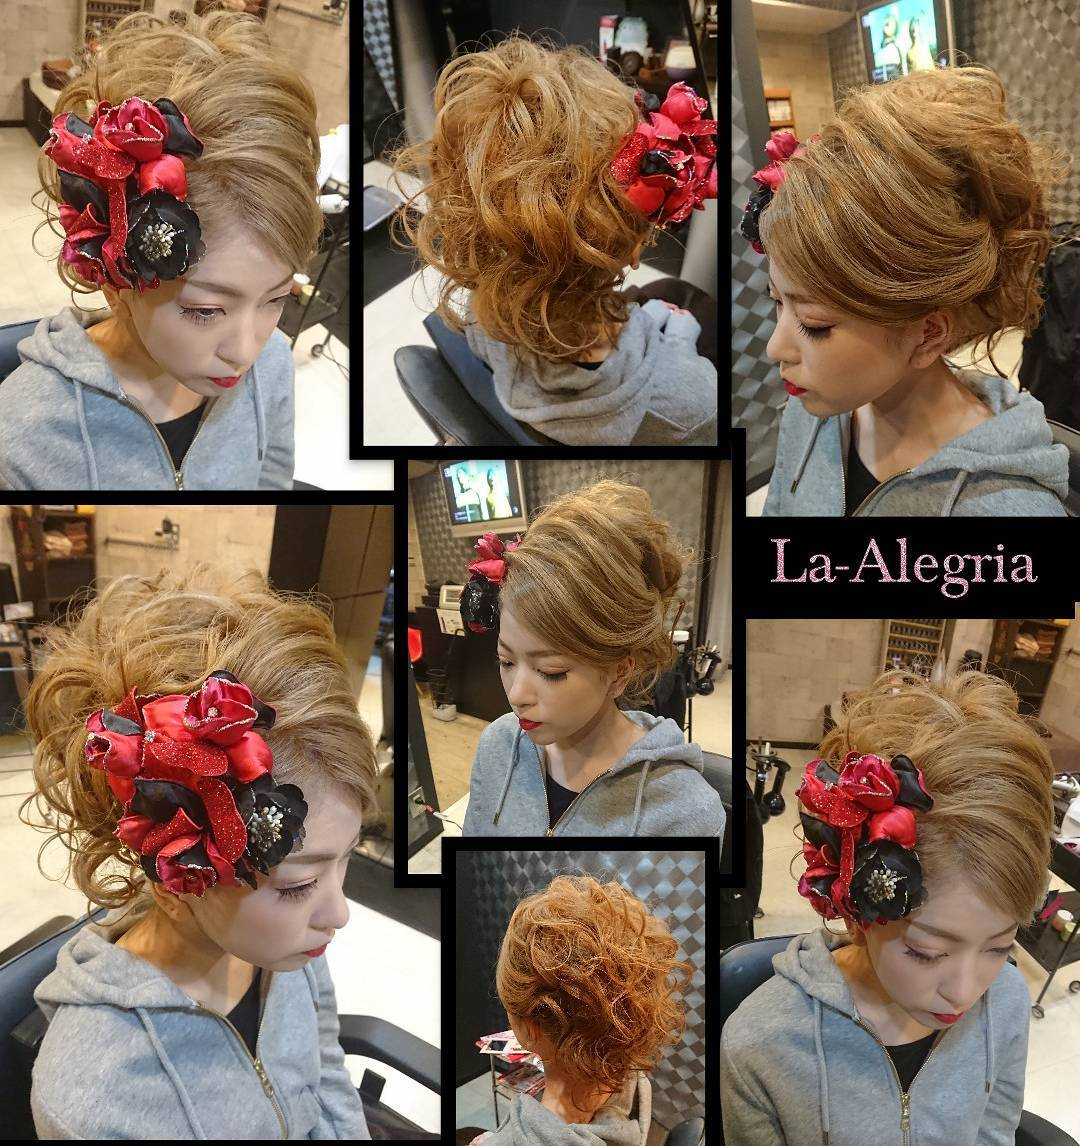 http://beauty-salon-la-alegria-ubecity.com/news/318.jpg